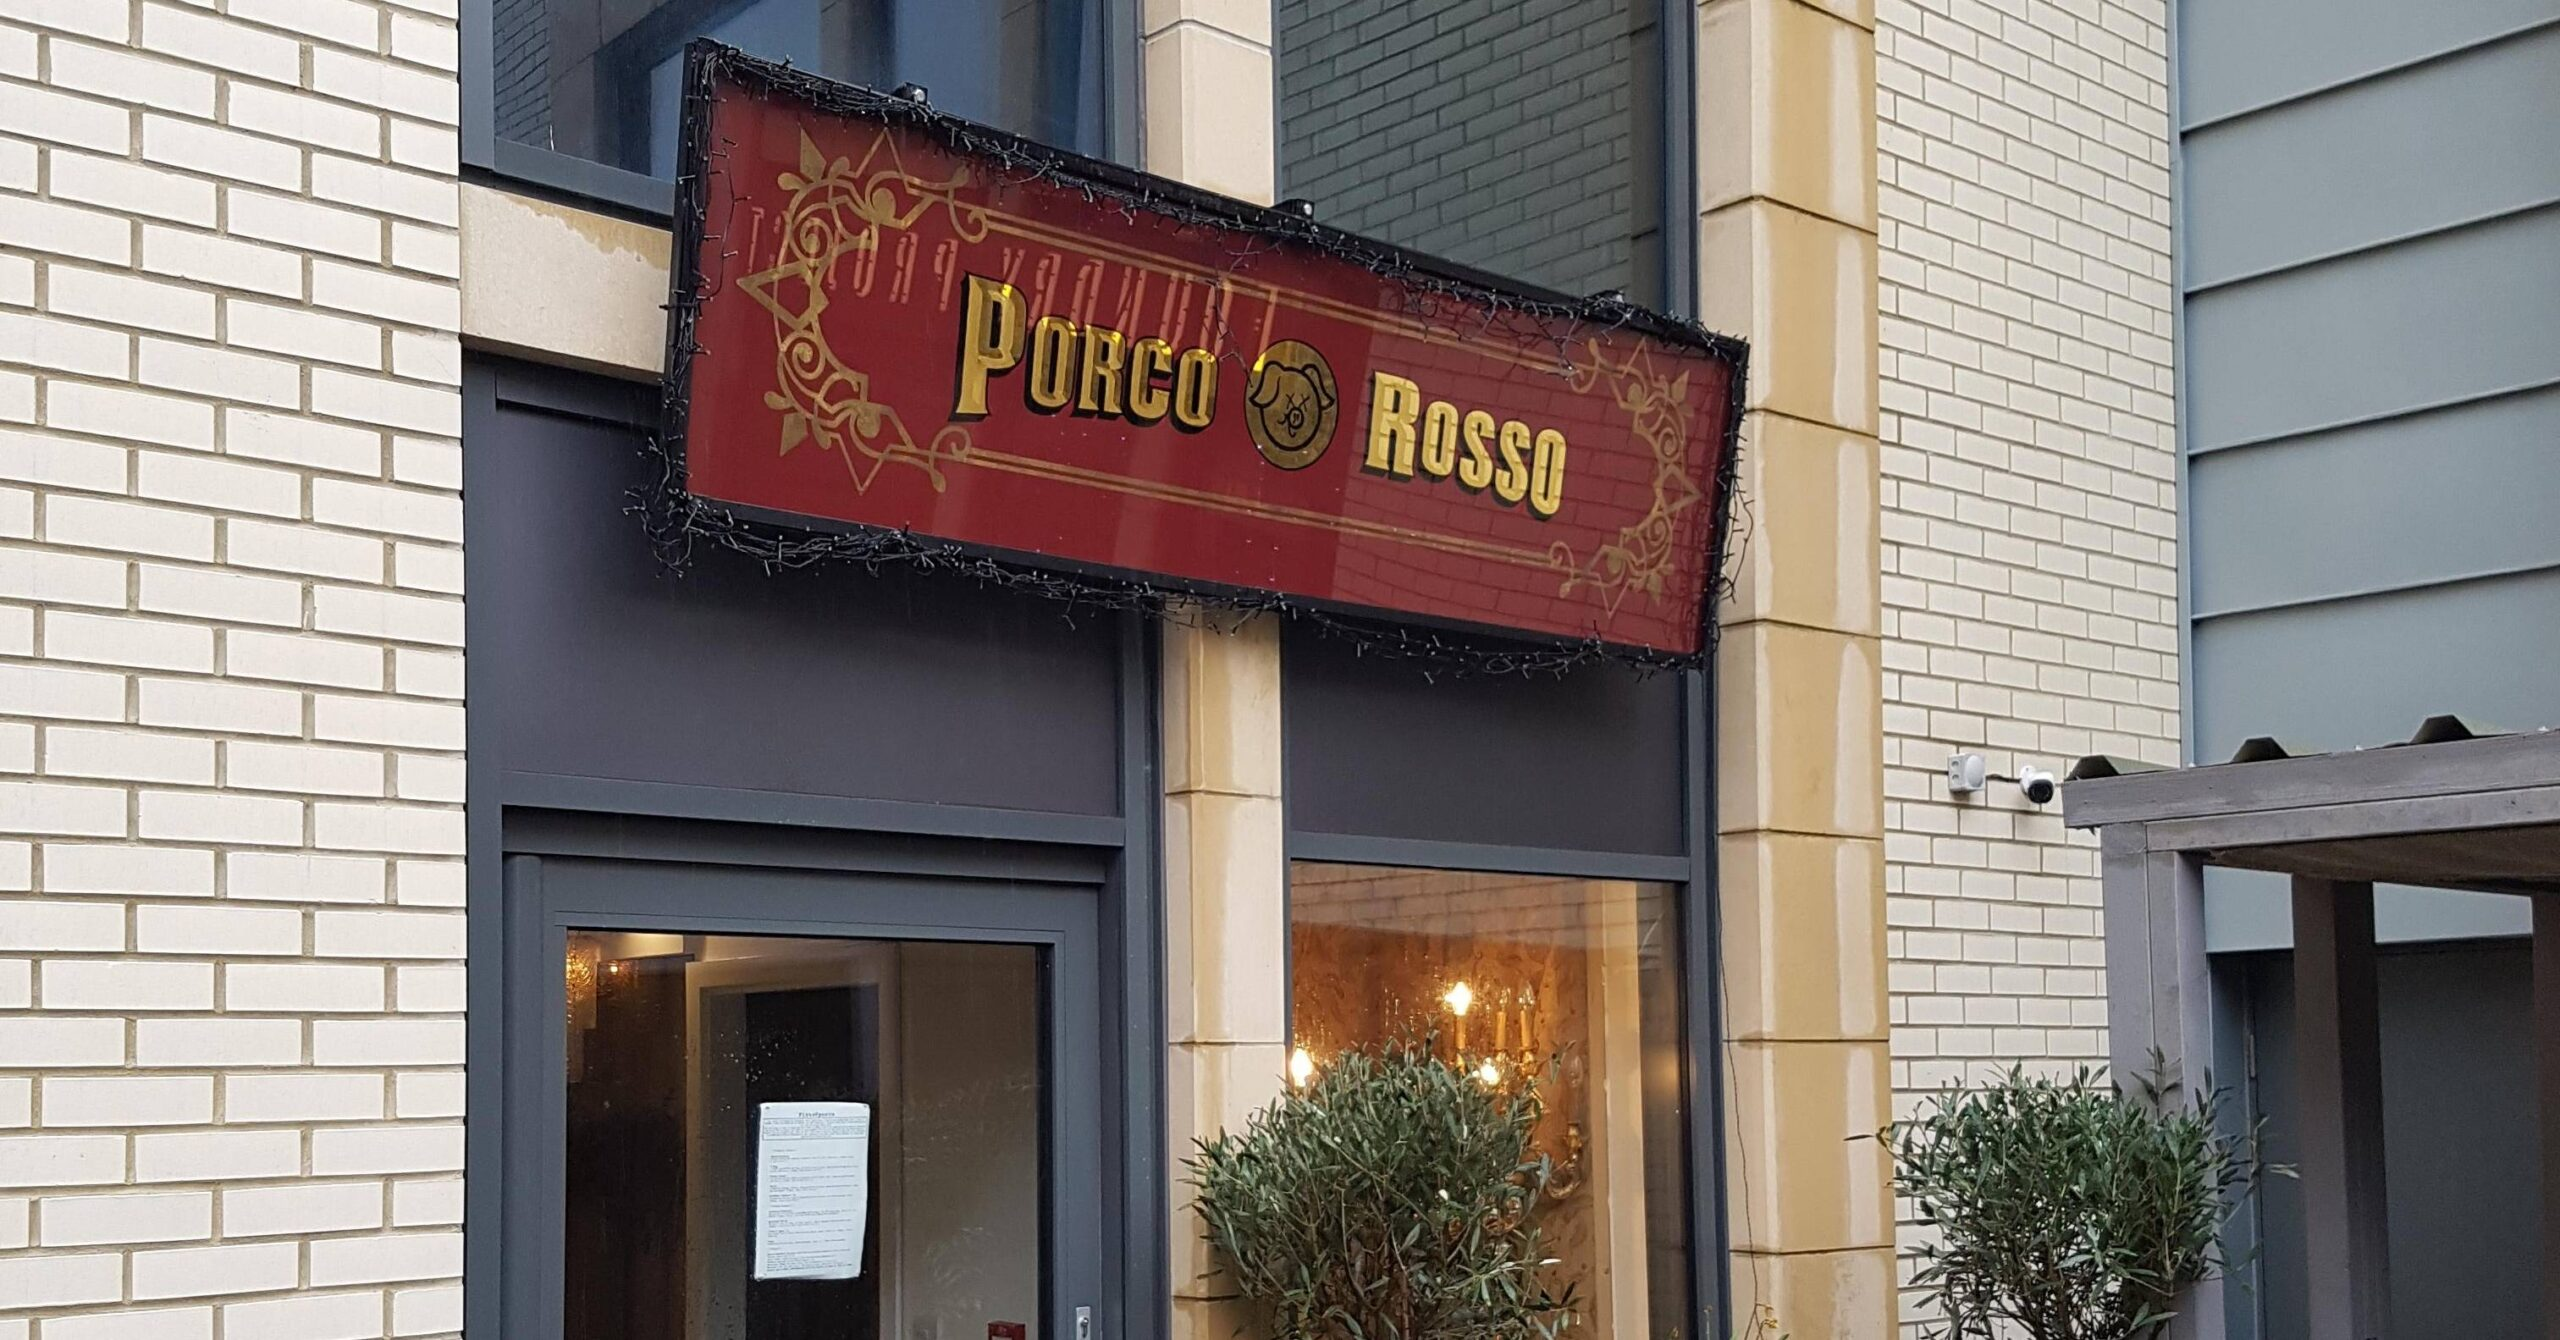 Italian bar and restaurant closes in Harrogate